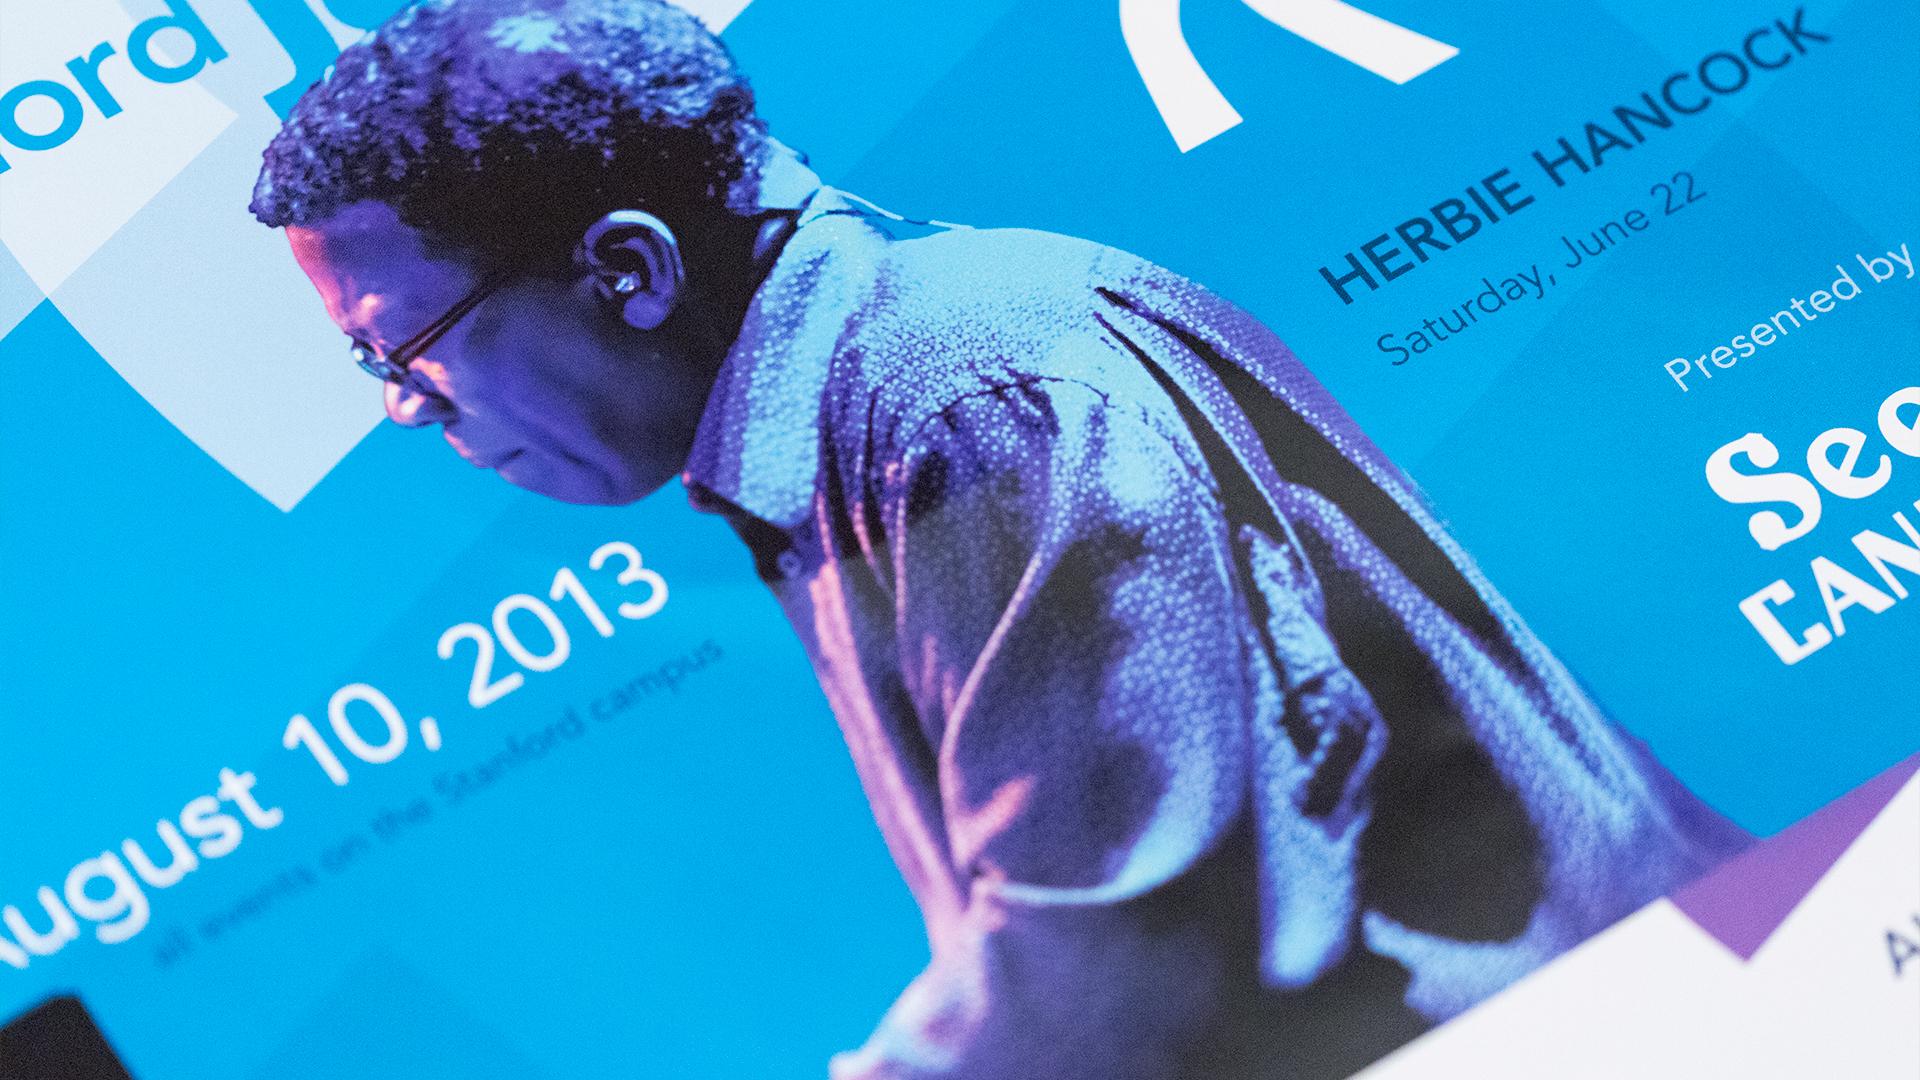 Print – Festival Flyers (Herbie Hancock Close-Up)